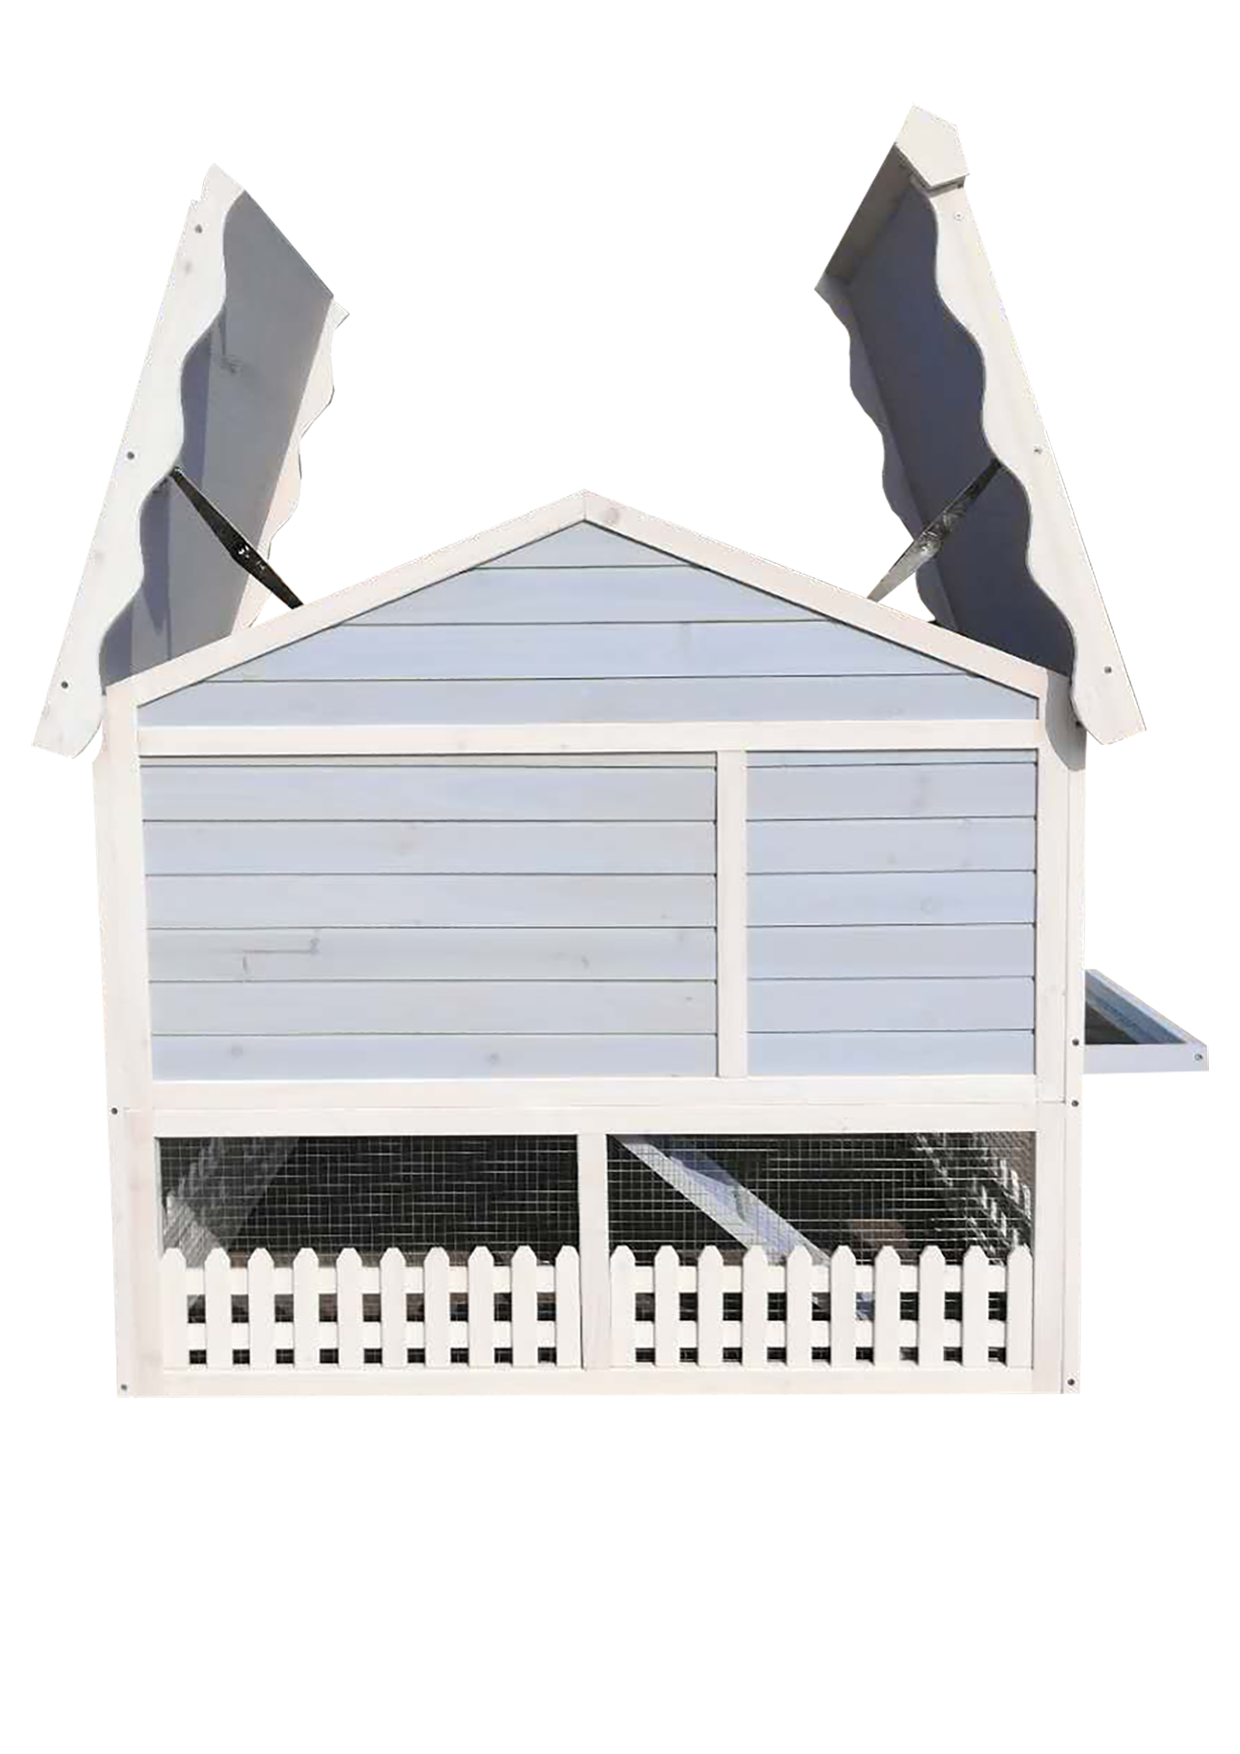 kaninchenstall diego grau dietschys gmbh. Black Bedroom Furniture Sets. Home Design Ideas